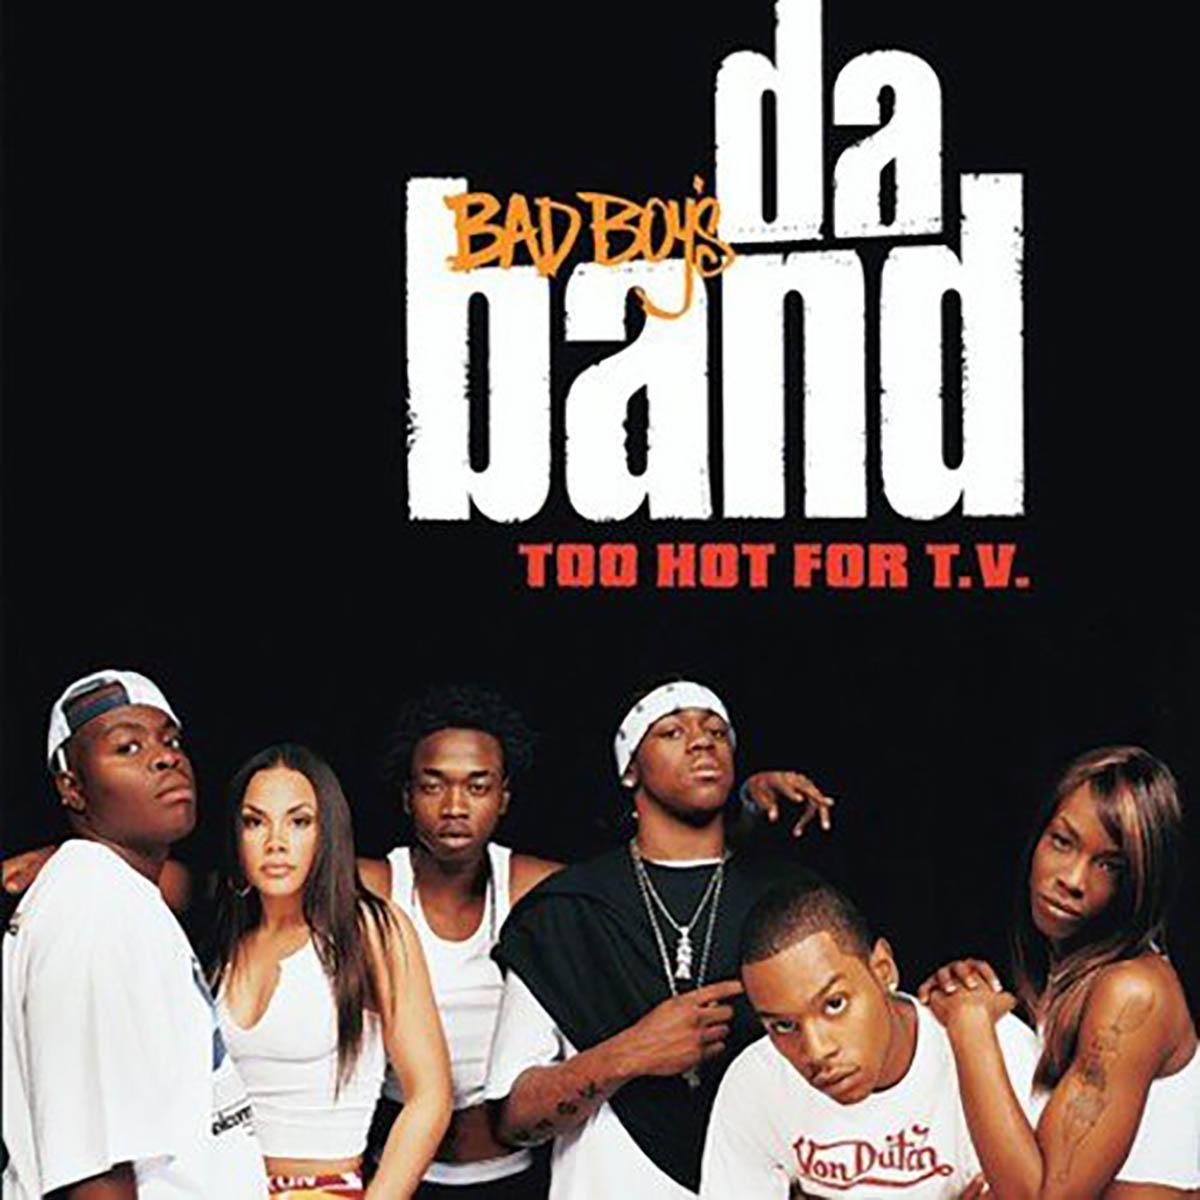 Bad Boy's Da Band, Too Hot for T.V.